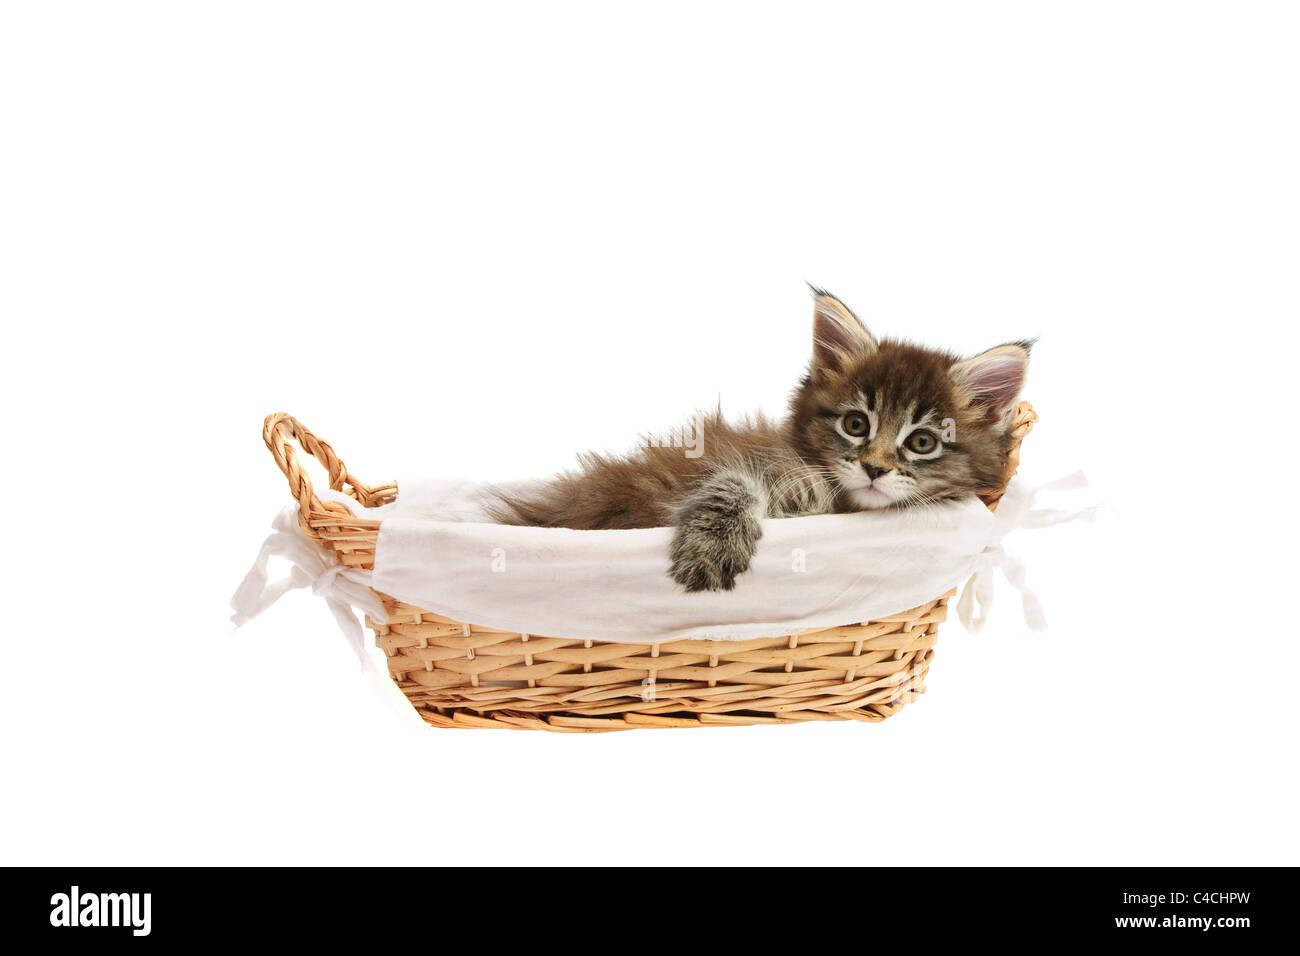 Small kitten in basket isoalted on white background - Stock Image